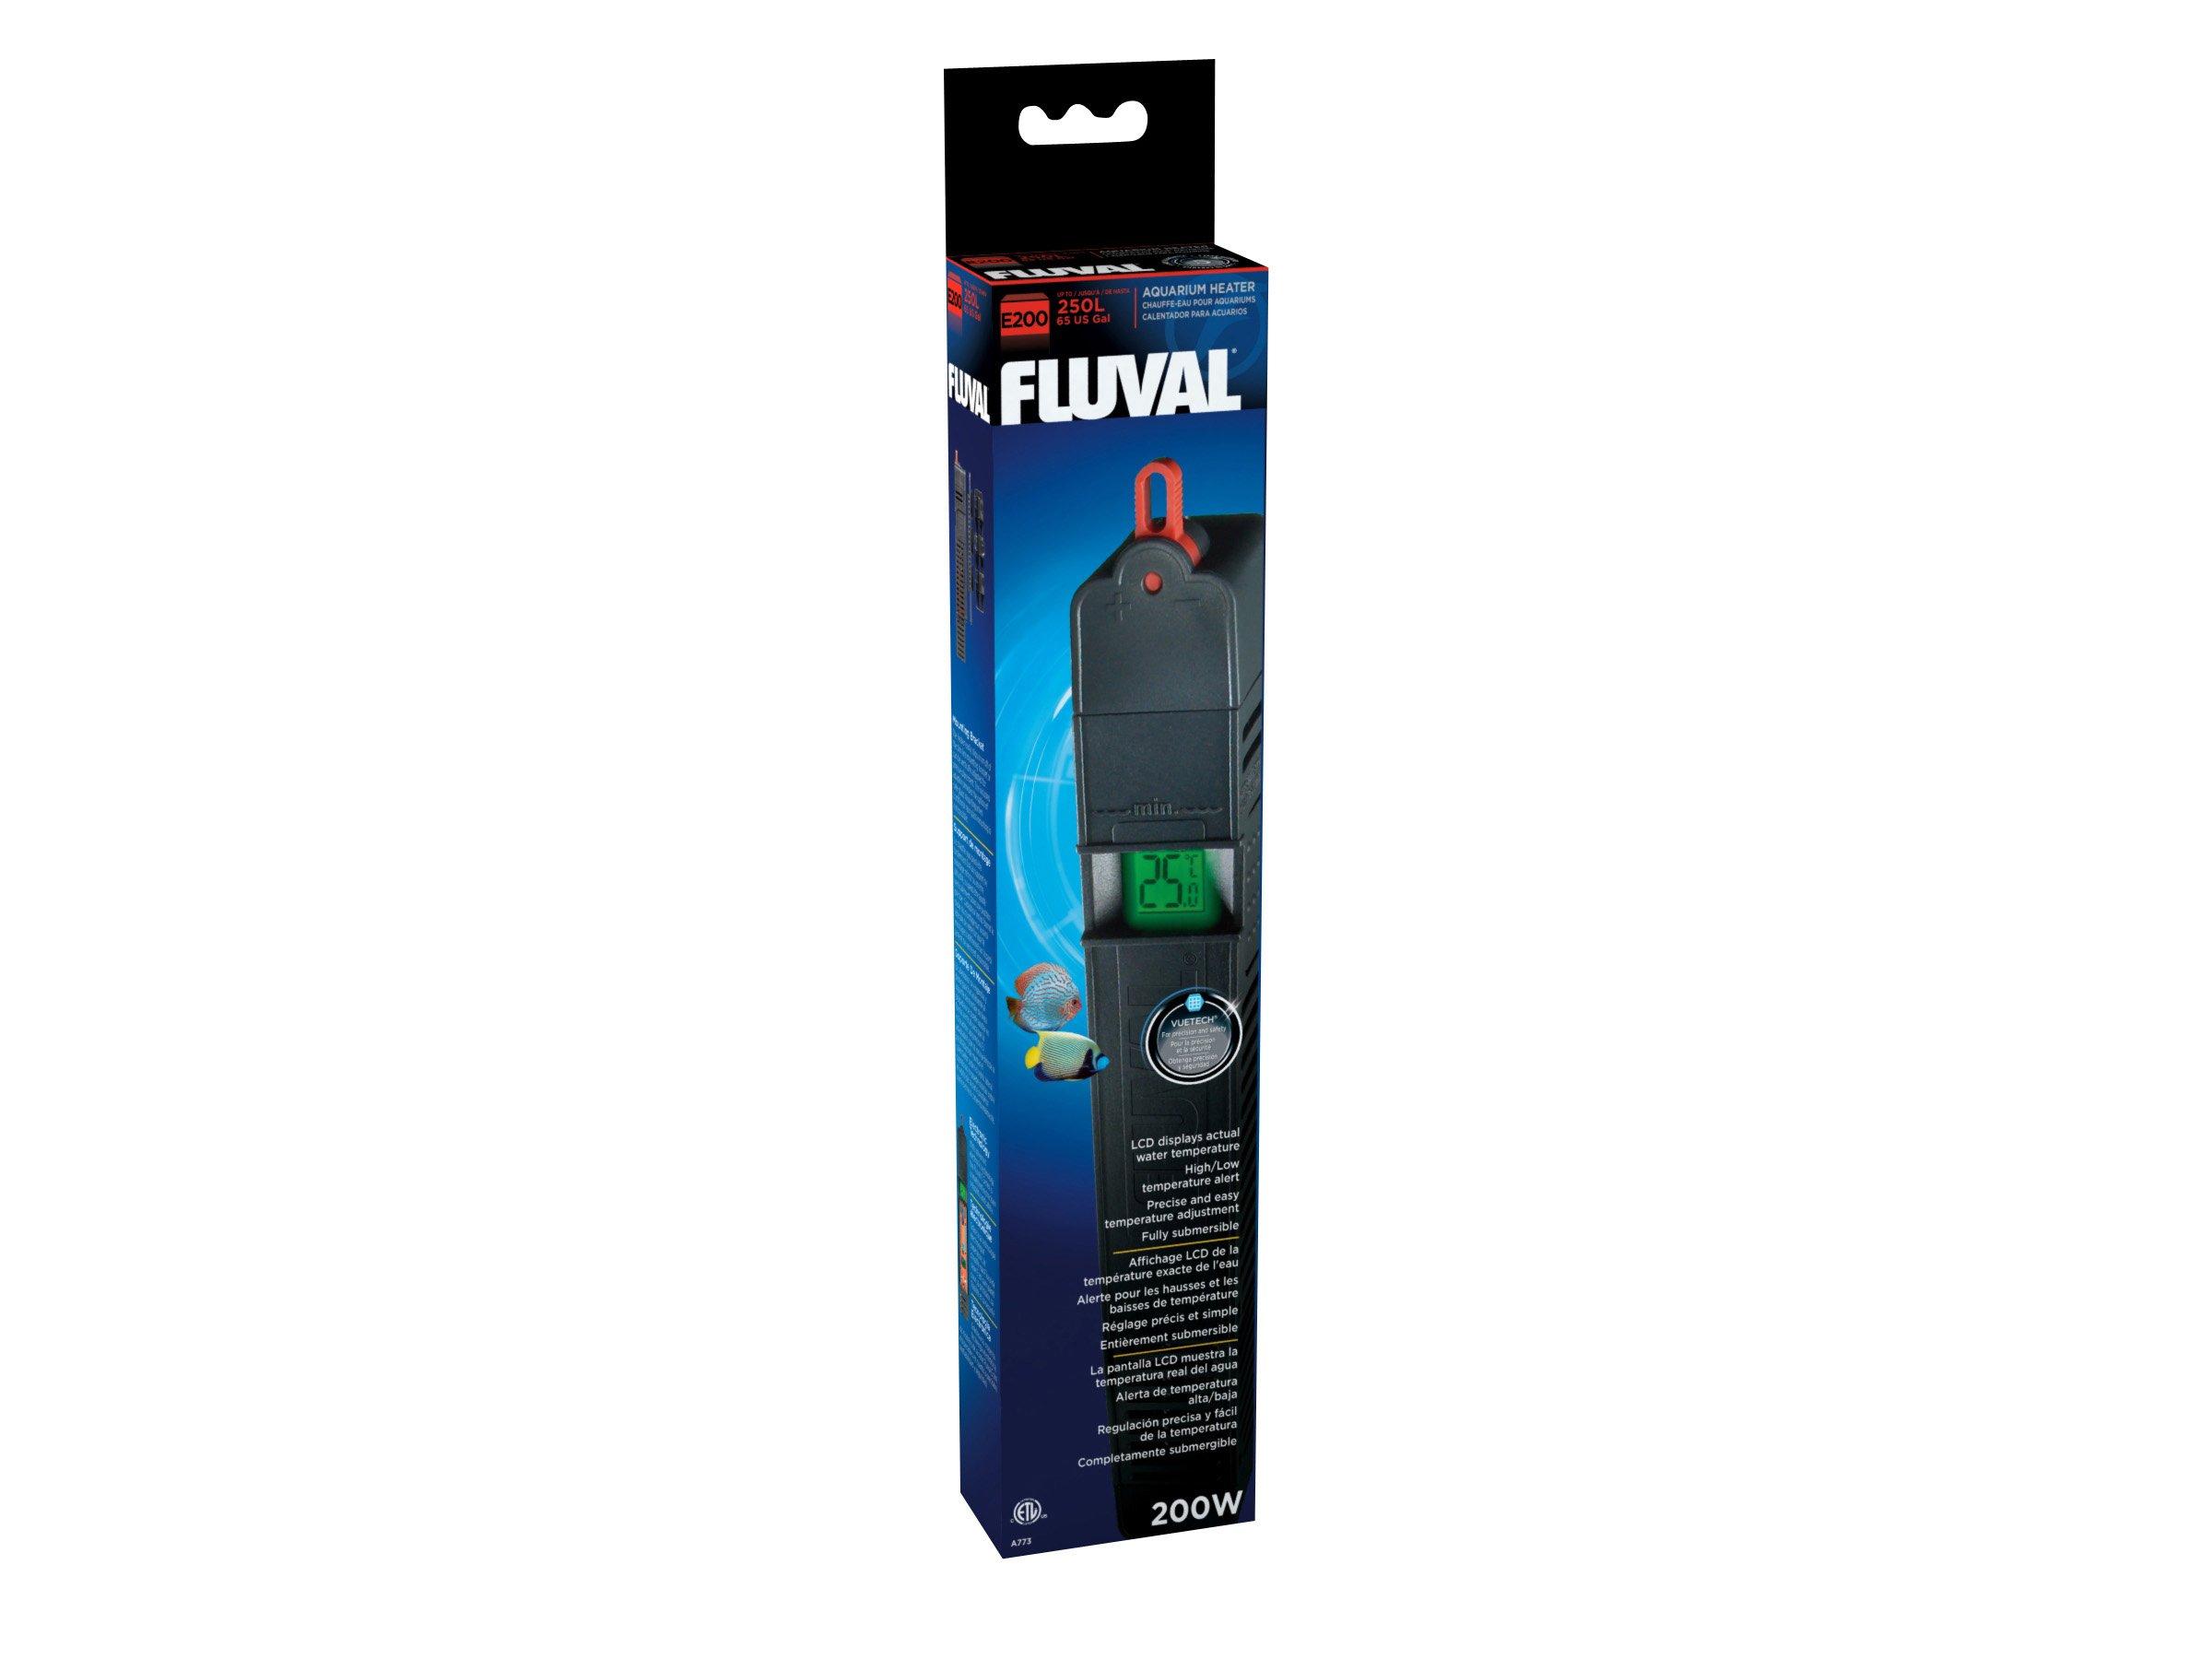 Fluval E 200-Watt Electronic Heater